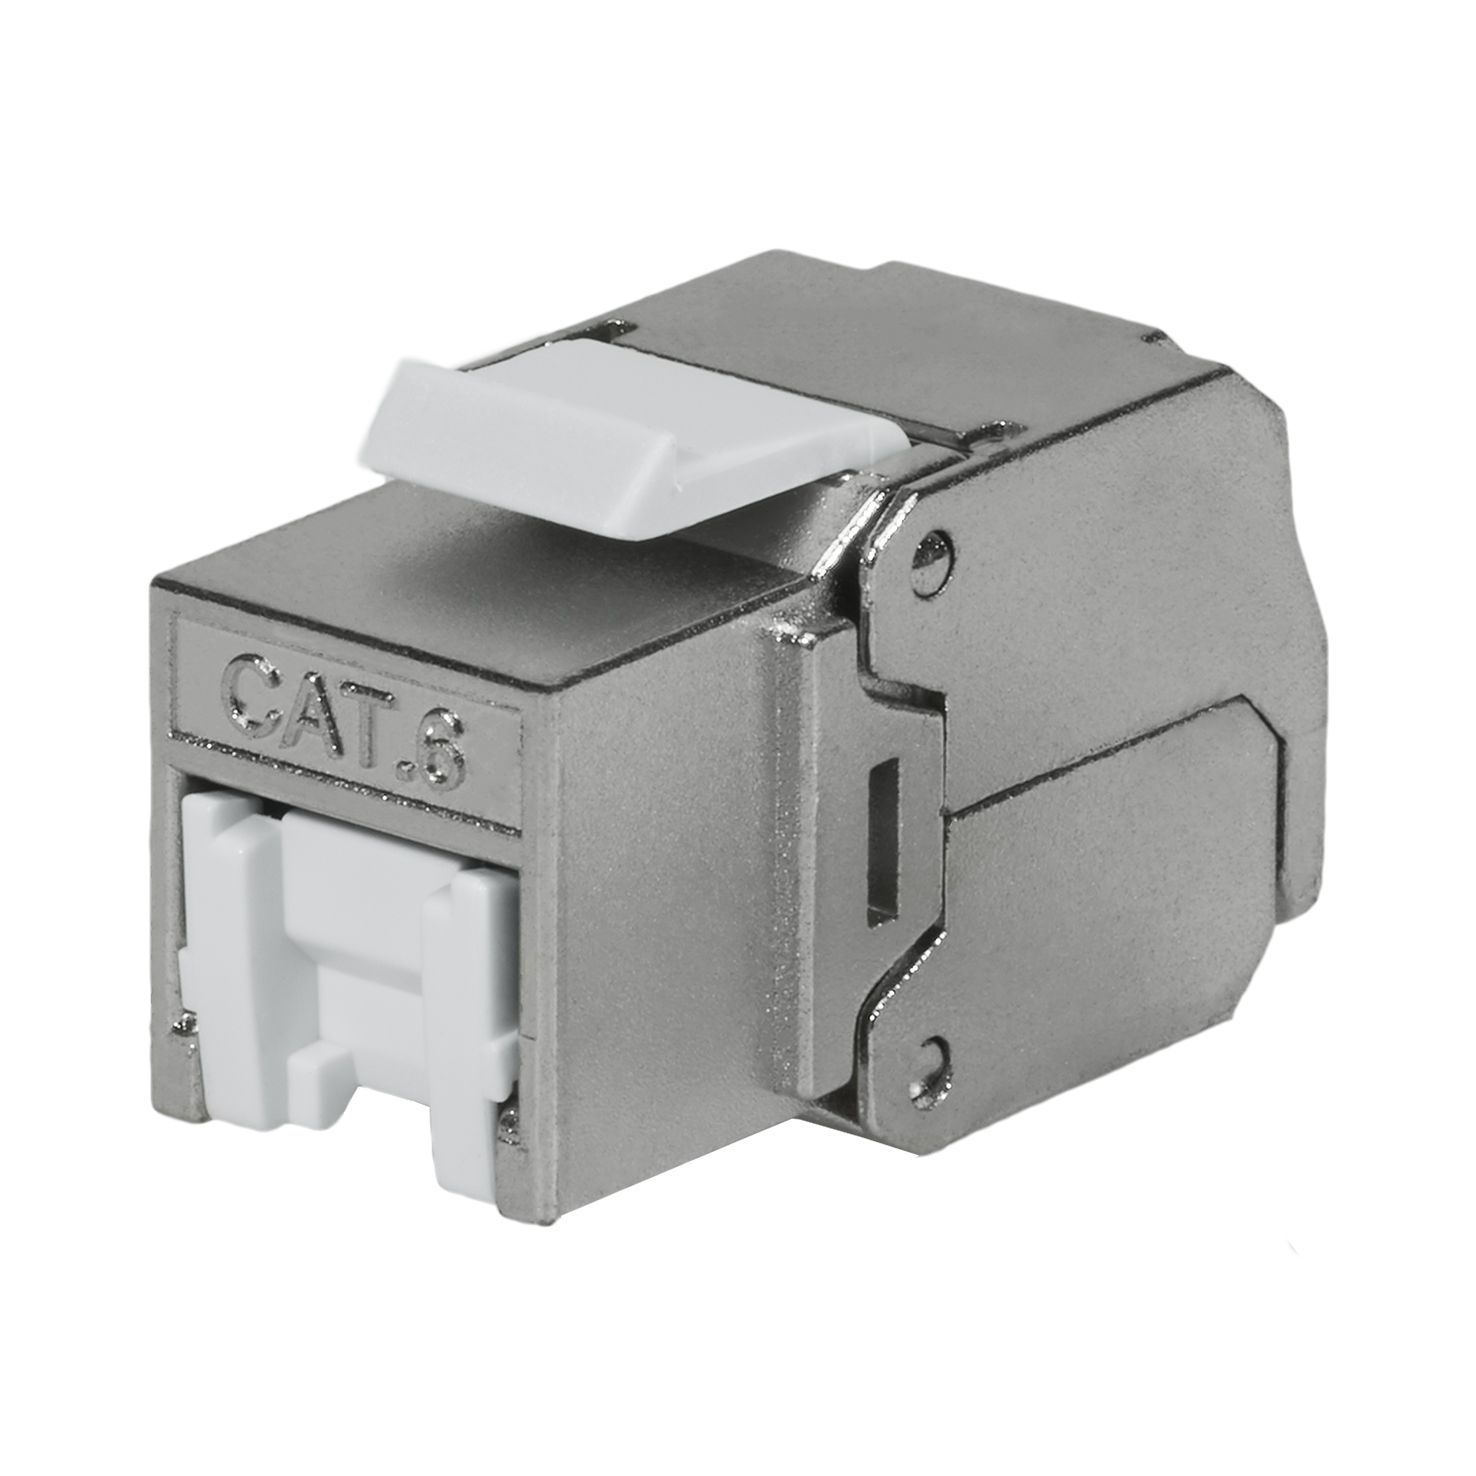 Cat6 STP 180° Toolless RJ45 Keystone Jack With Shutter - Cat 6 FTP 180 Degree Toolless Keystone Jack with shutter